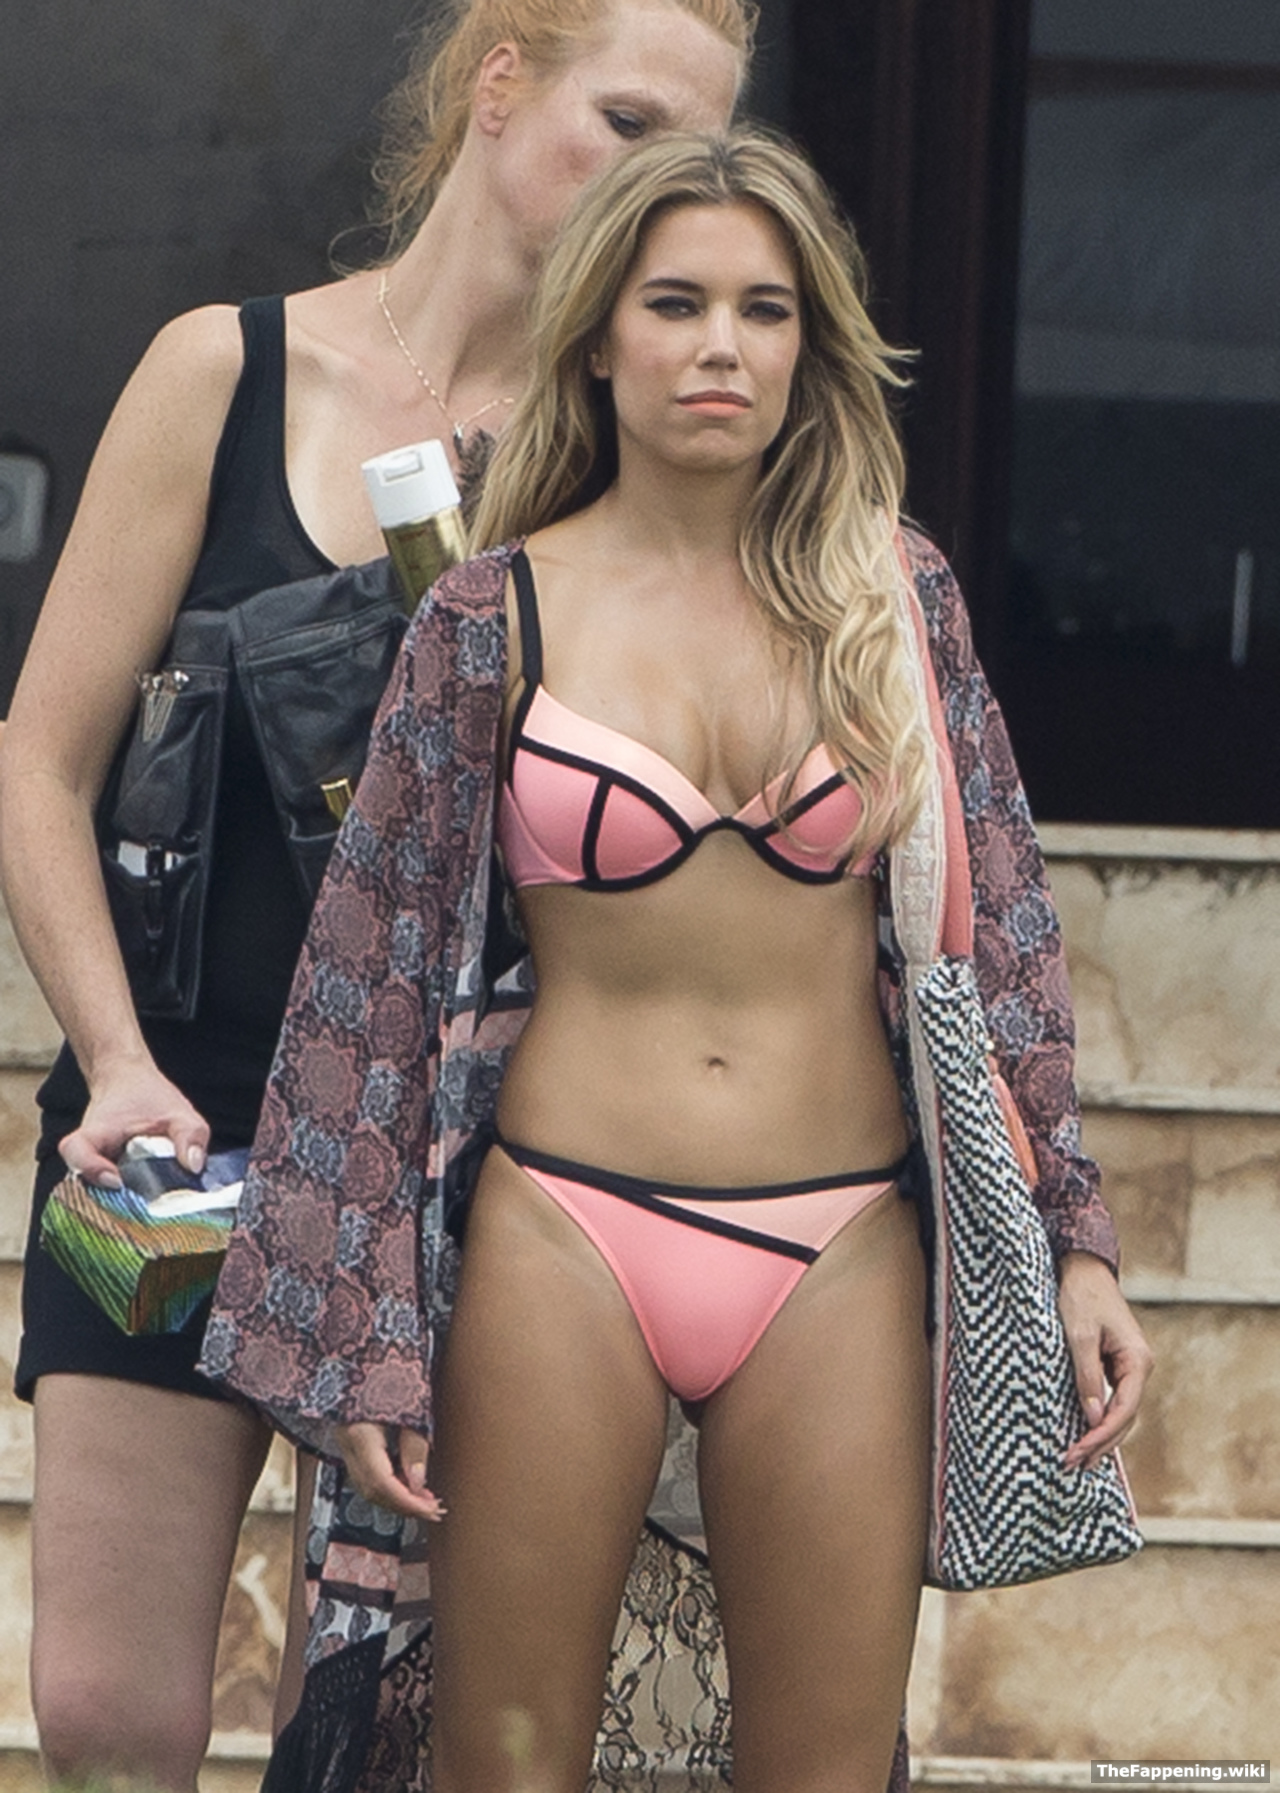 Sylvie van der vaart nude fake